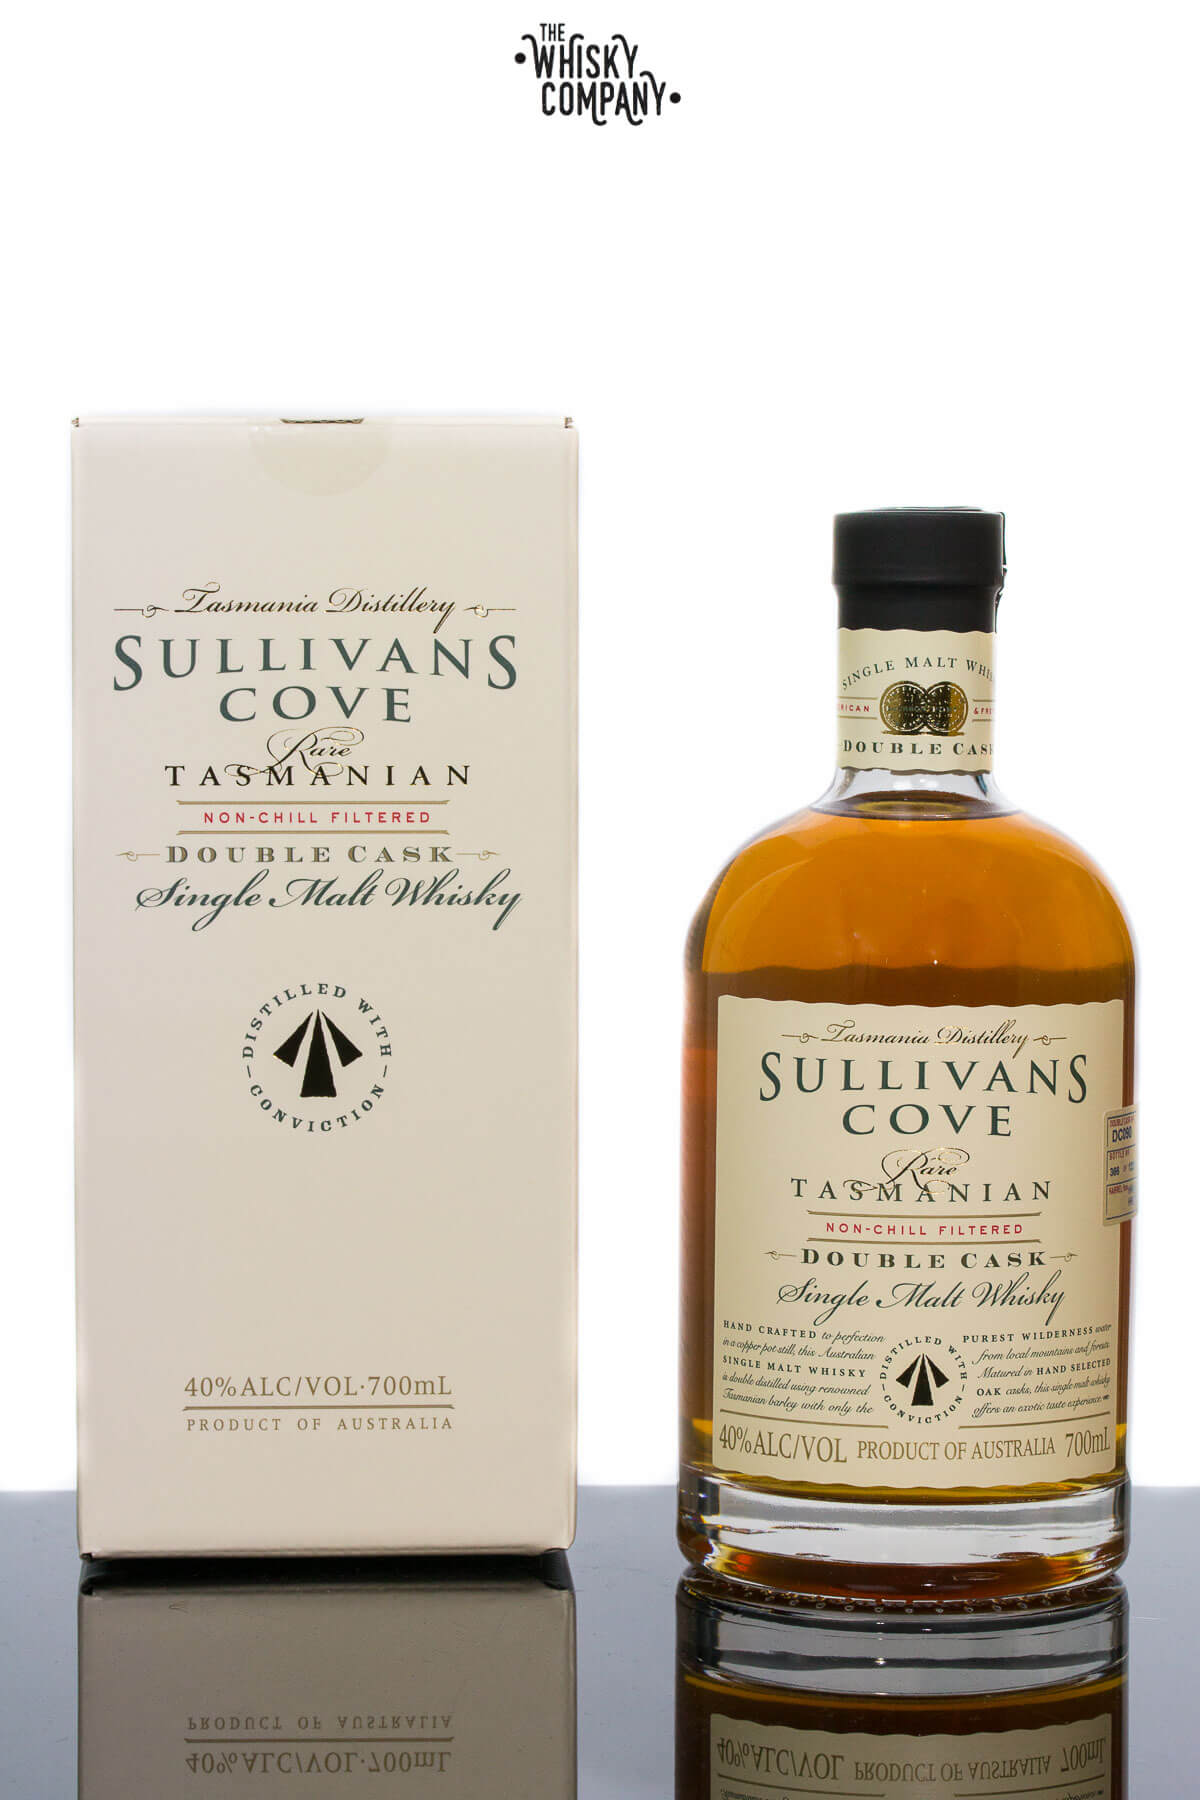 Sullivans Cove Double Cask DC085 Australian Single Malt Whisky